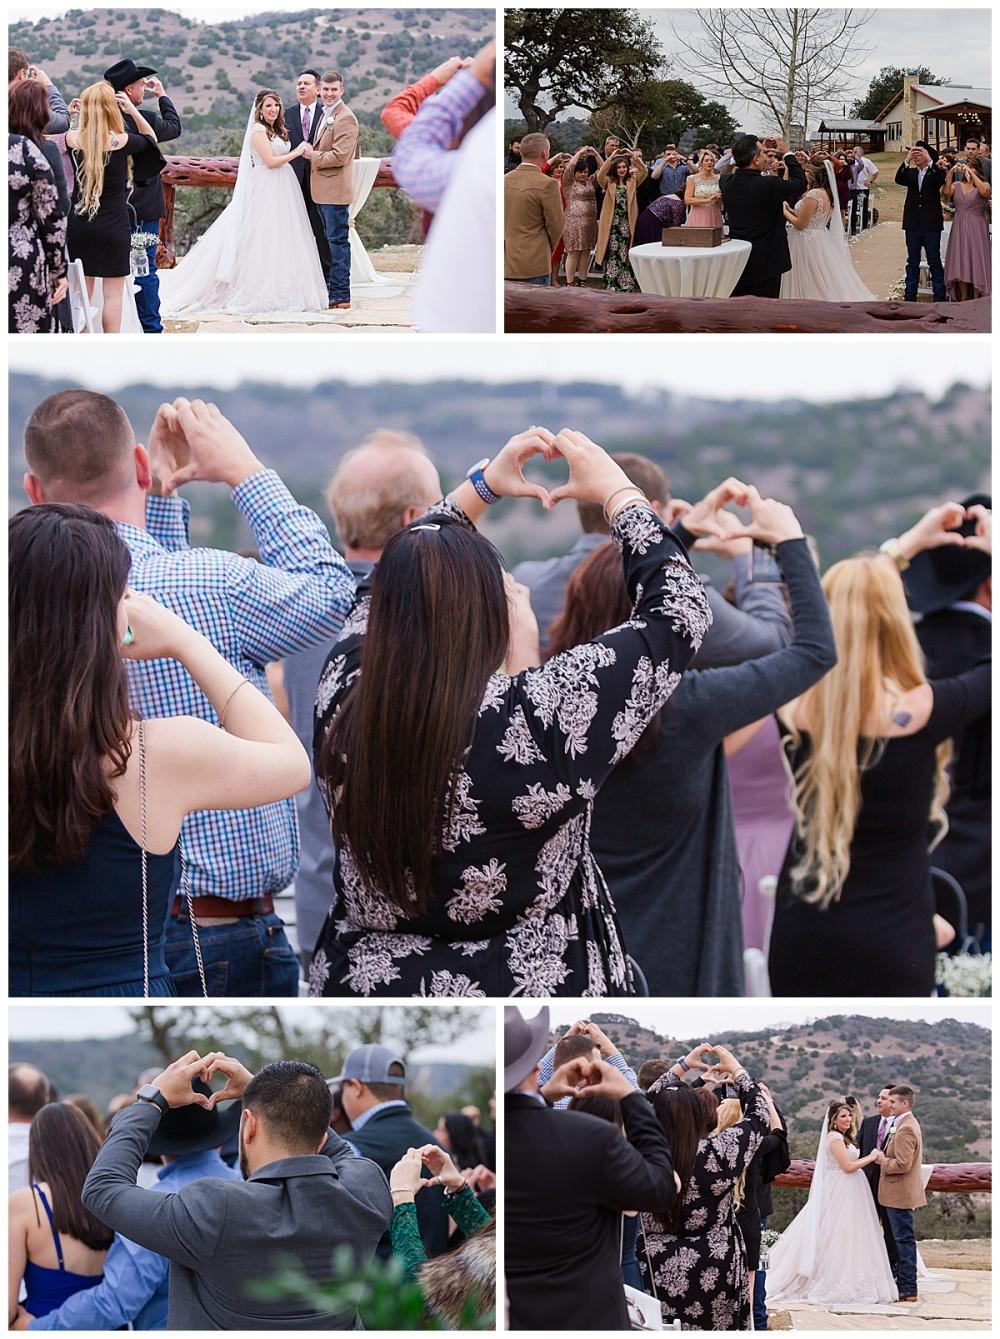 Wedding-Photographer-Texas-Hill-Country-Happy-H-Ranch-Comfor-Texas-Carly-Barton-Photography_0026.jpg